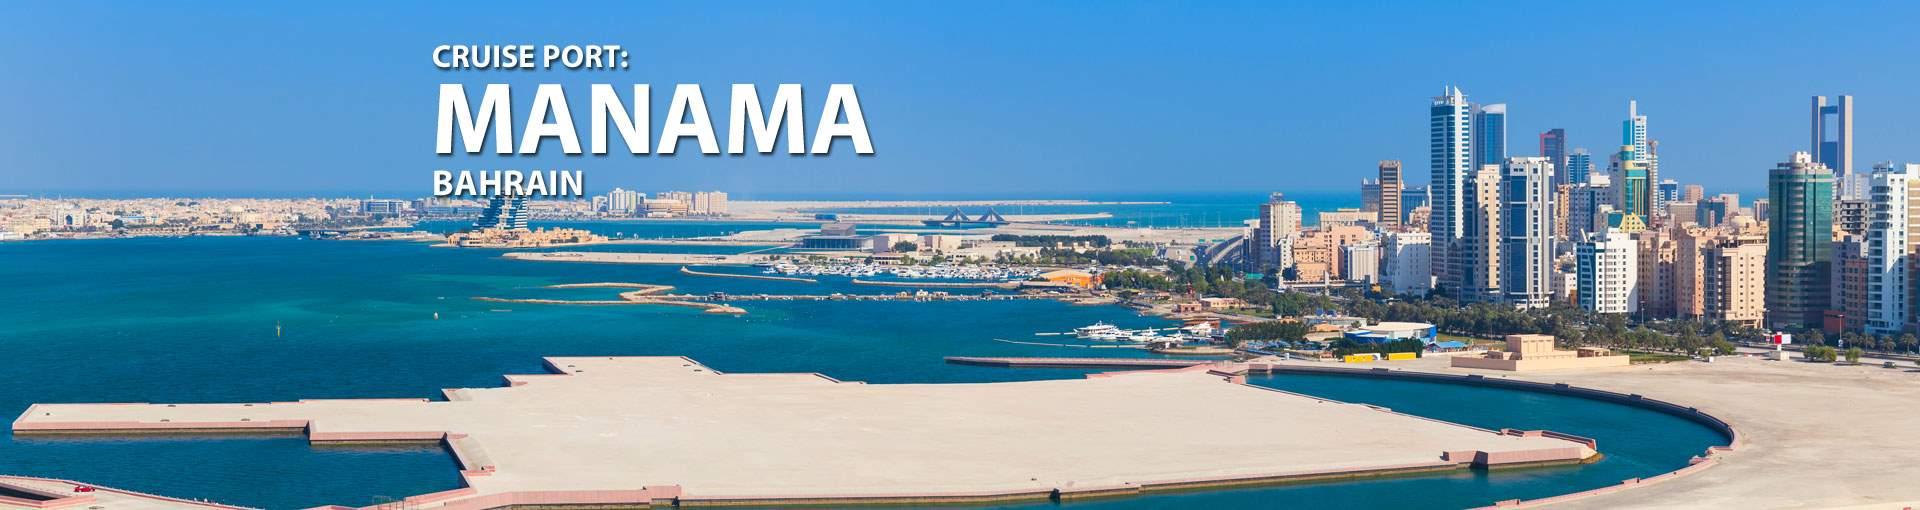 Cruises to Manama, Bahrain